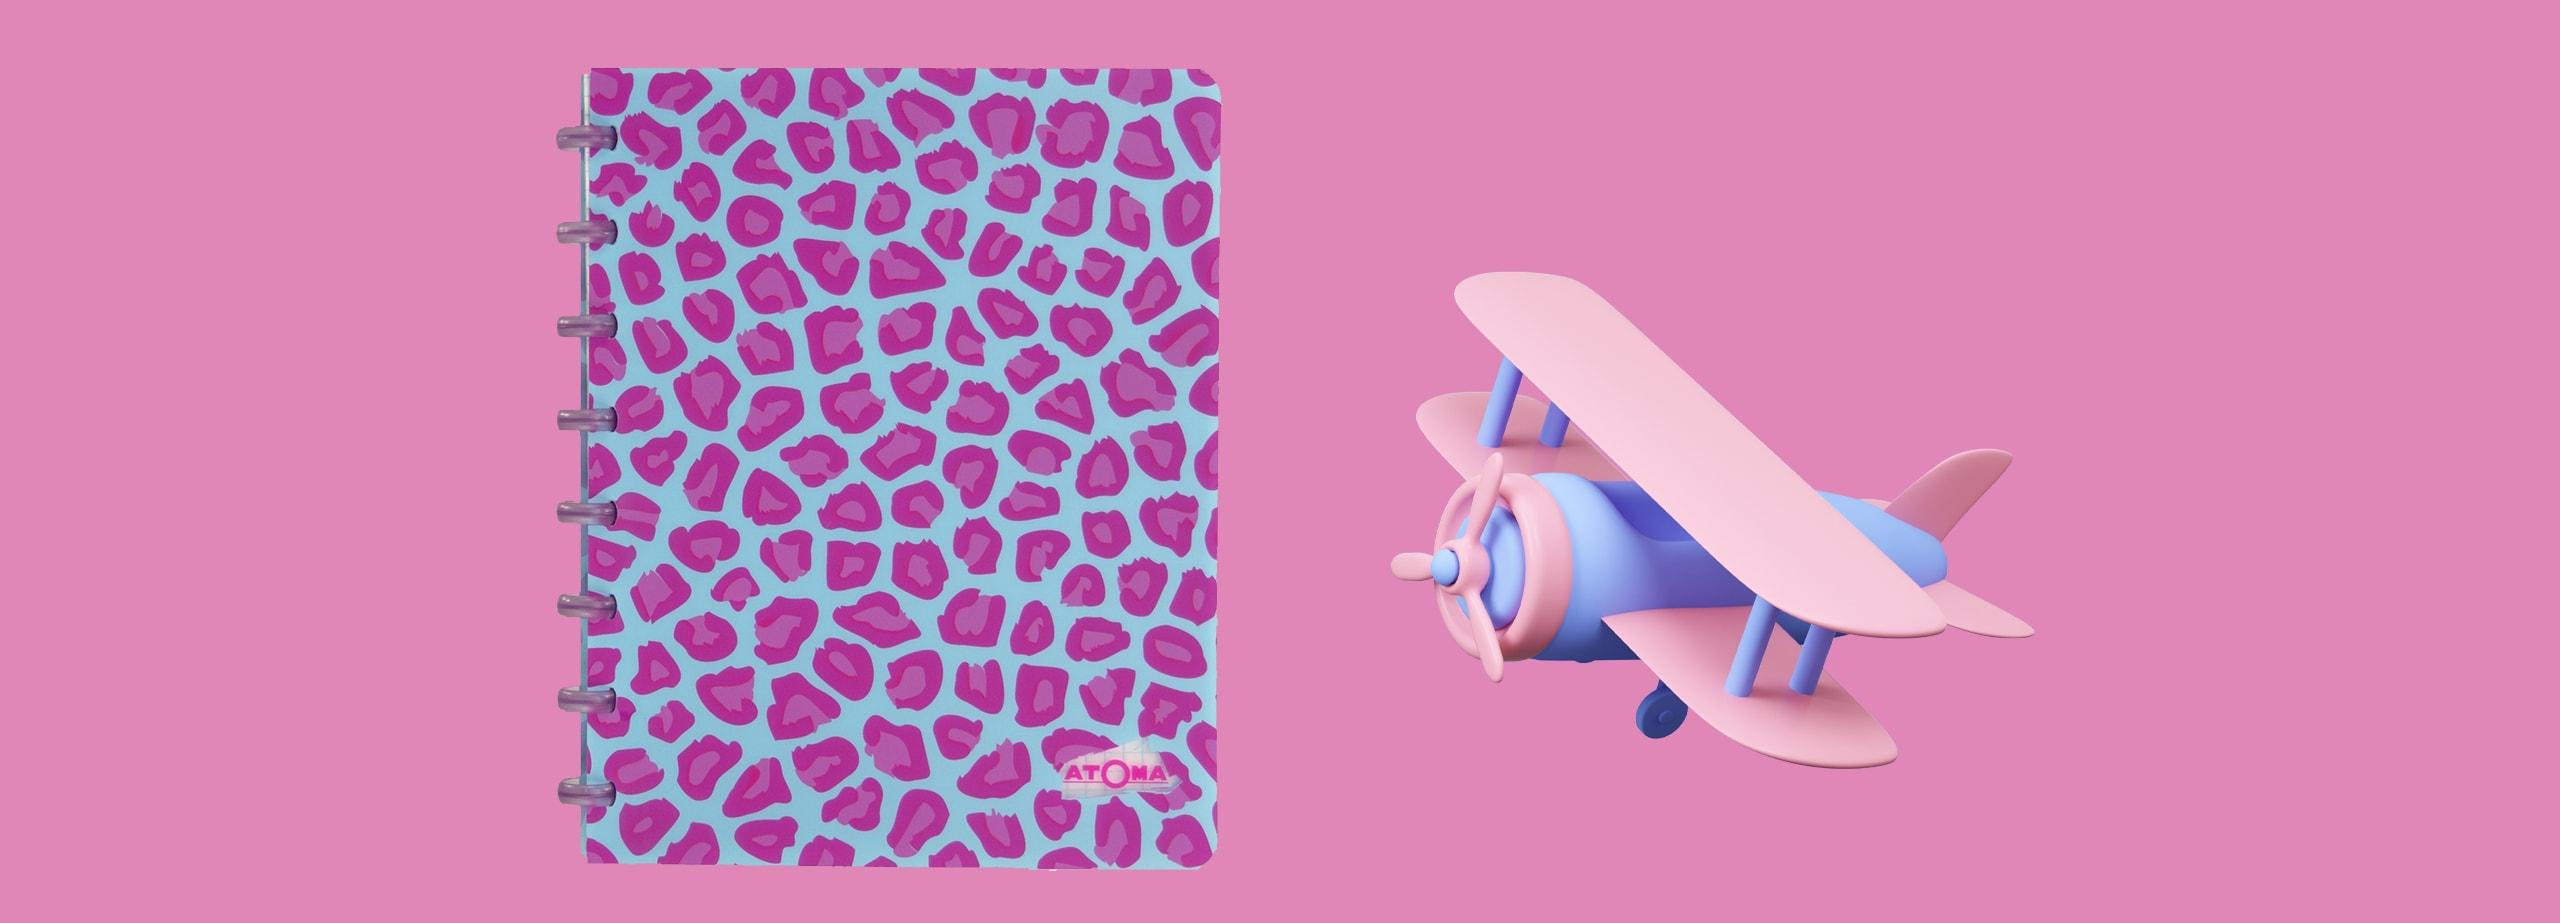 Atoma - Leopard